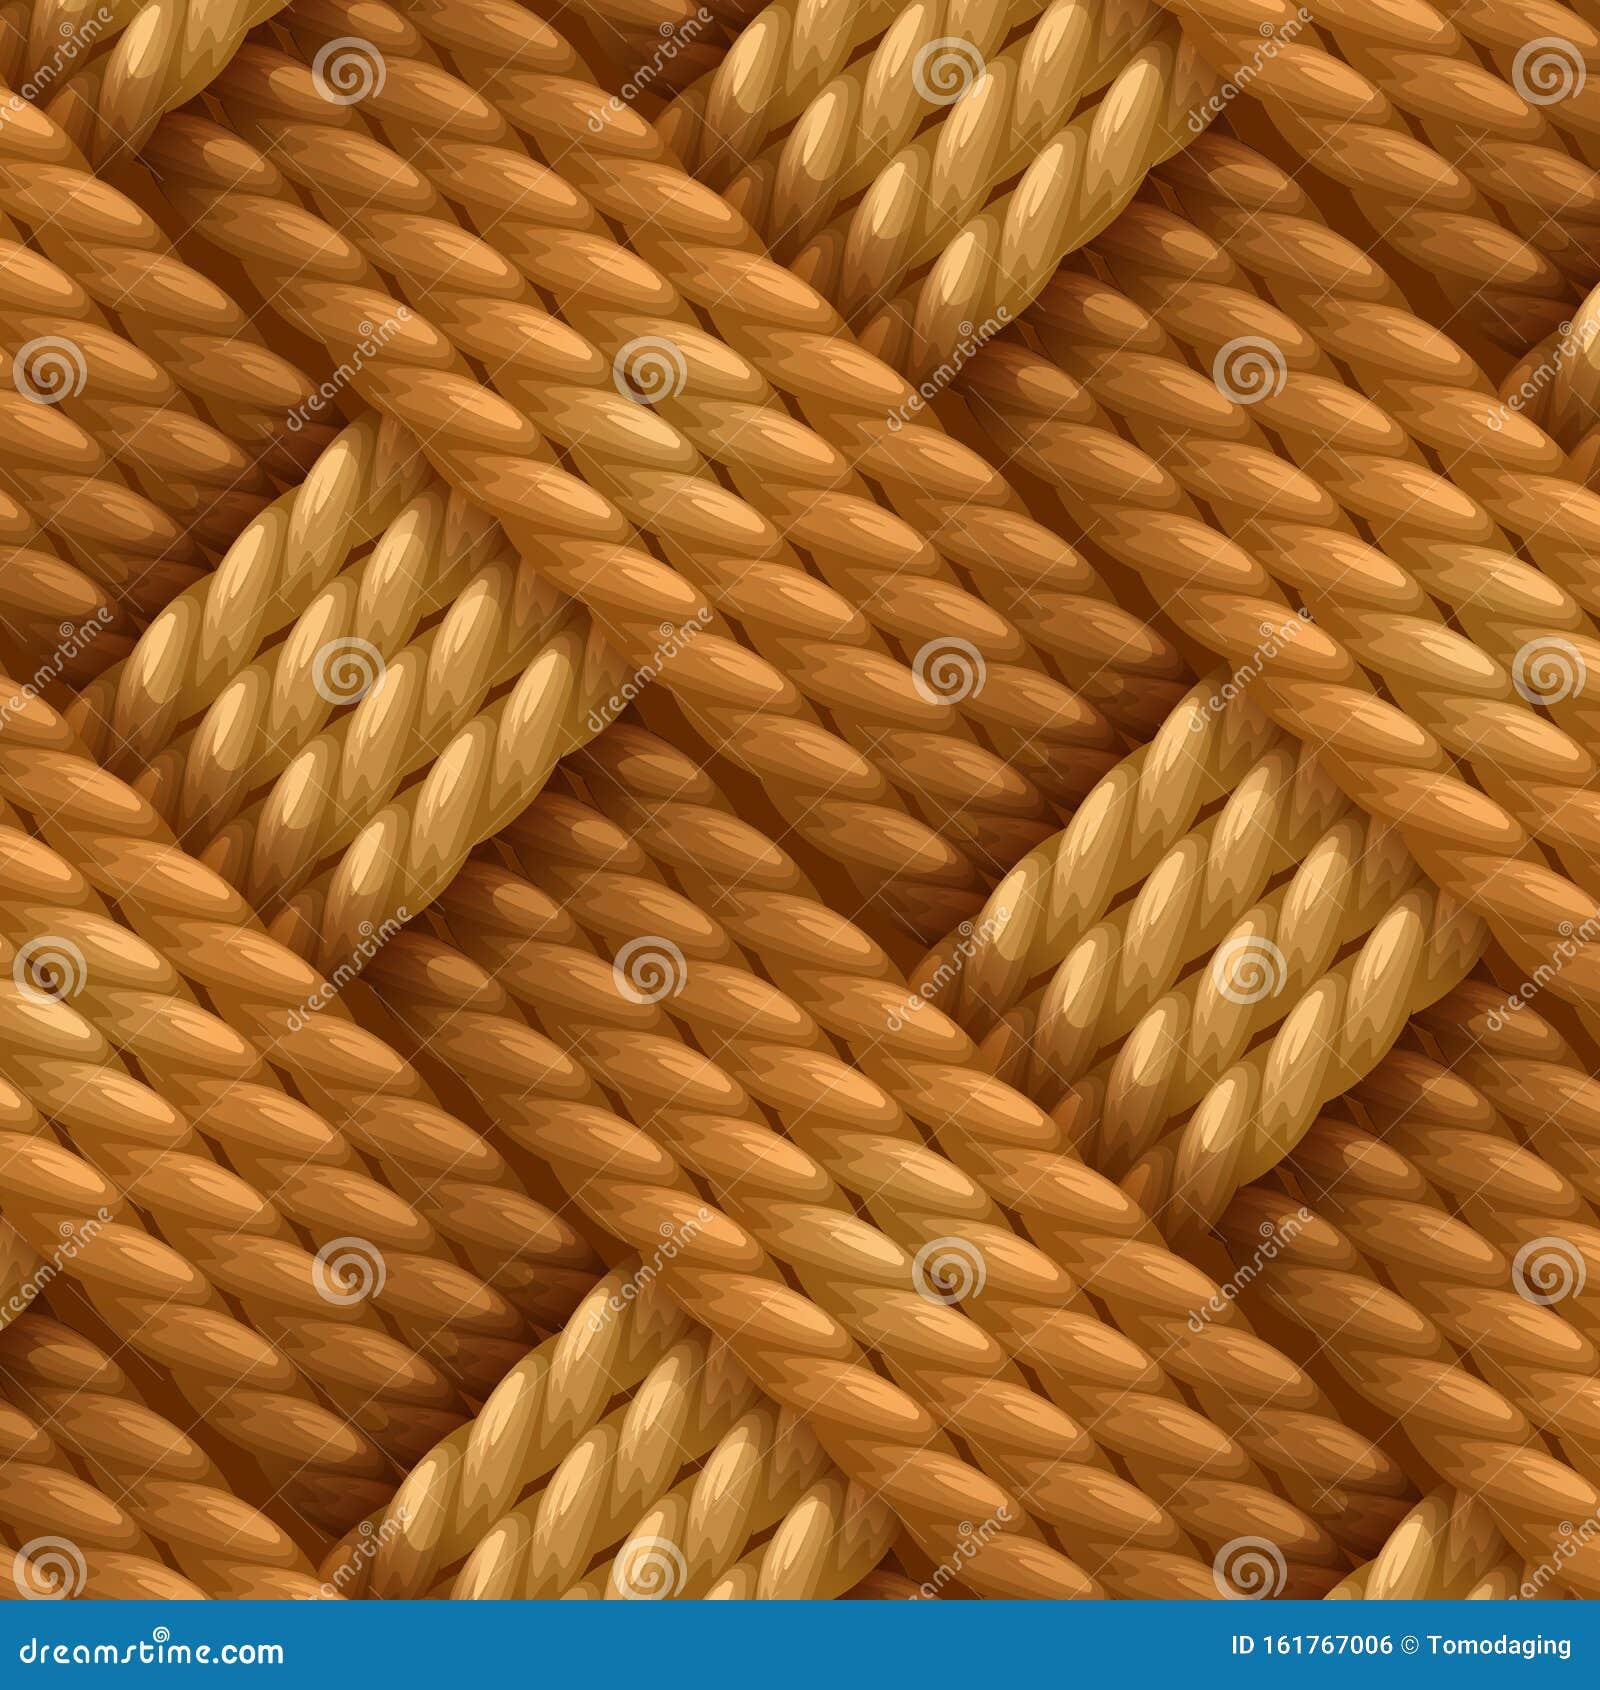 Hemp Rope Stock Illustrations 712 Hemp Rope Stock Illustrations Vectors Clipart Dreamstime